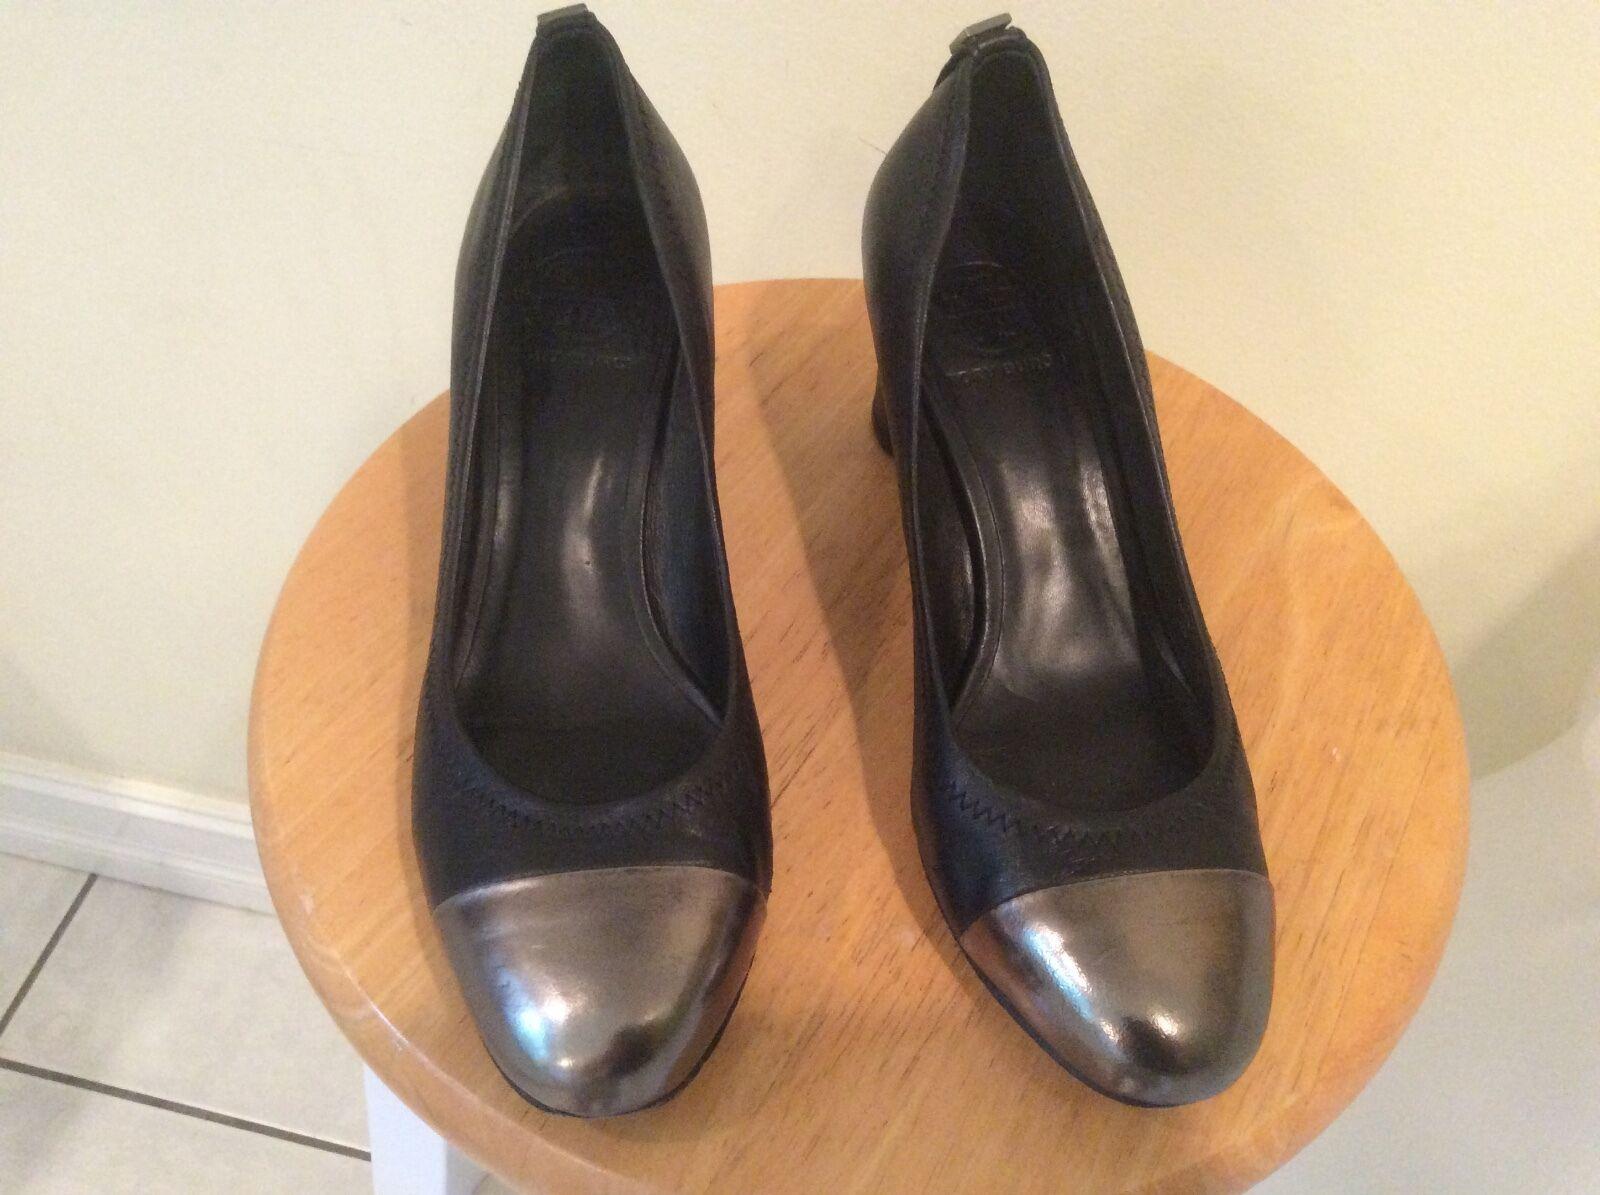 TORY BURCH Black Cap metallic Toe Block Heel Pumps Size 8 M